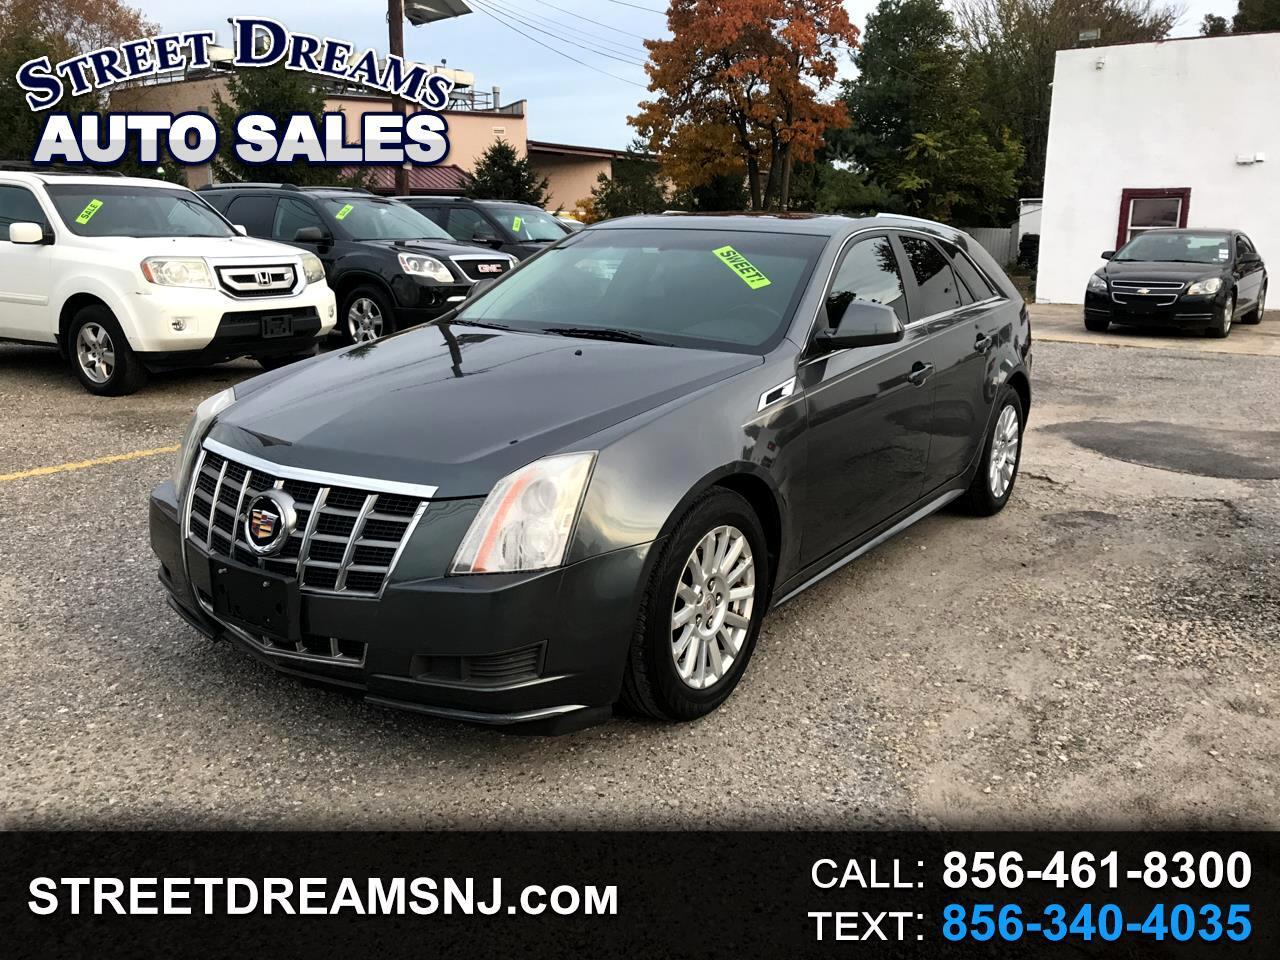 2012 Cadillac CTS Sport Wagon 3.0L Base